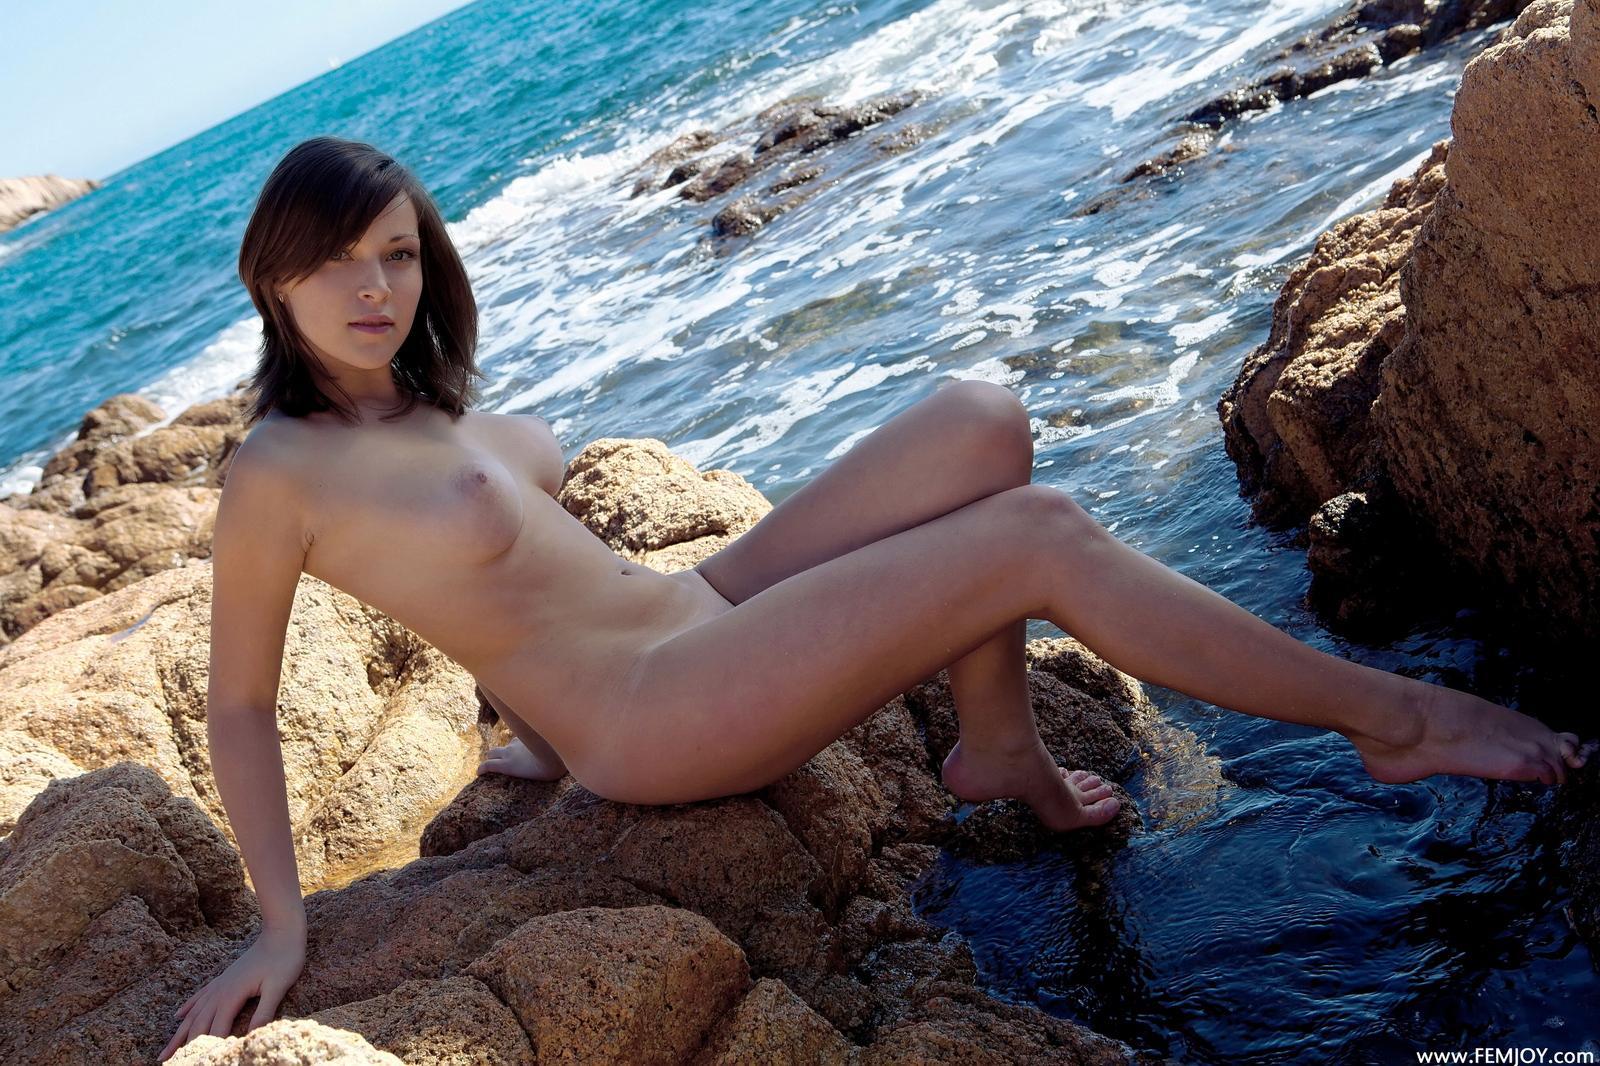 sophia-h-seaside-naked-boobs-rocks-femjoy-33